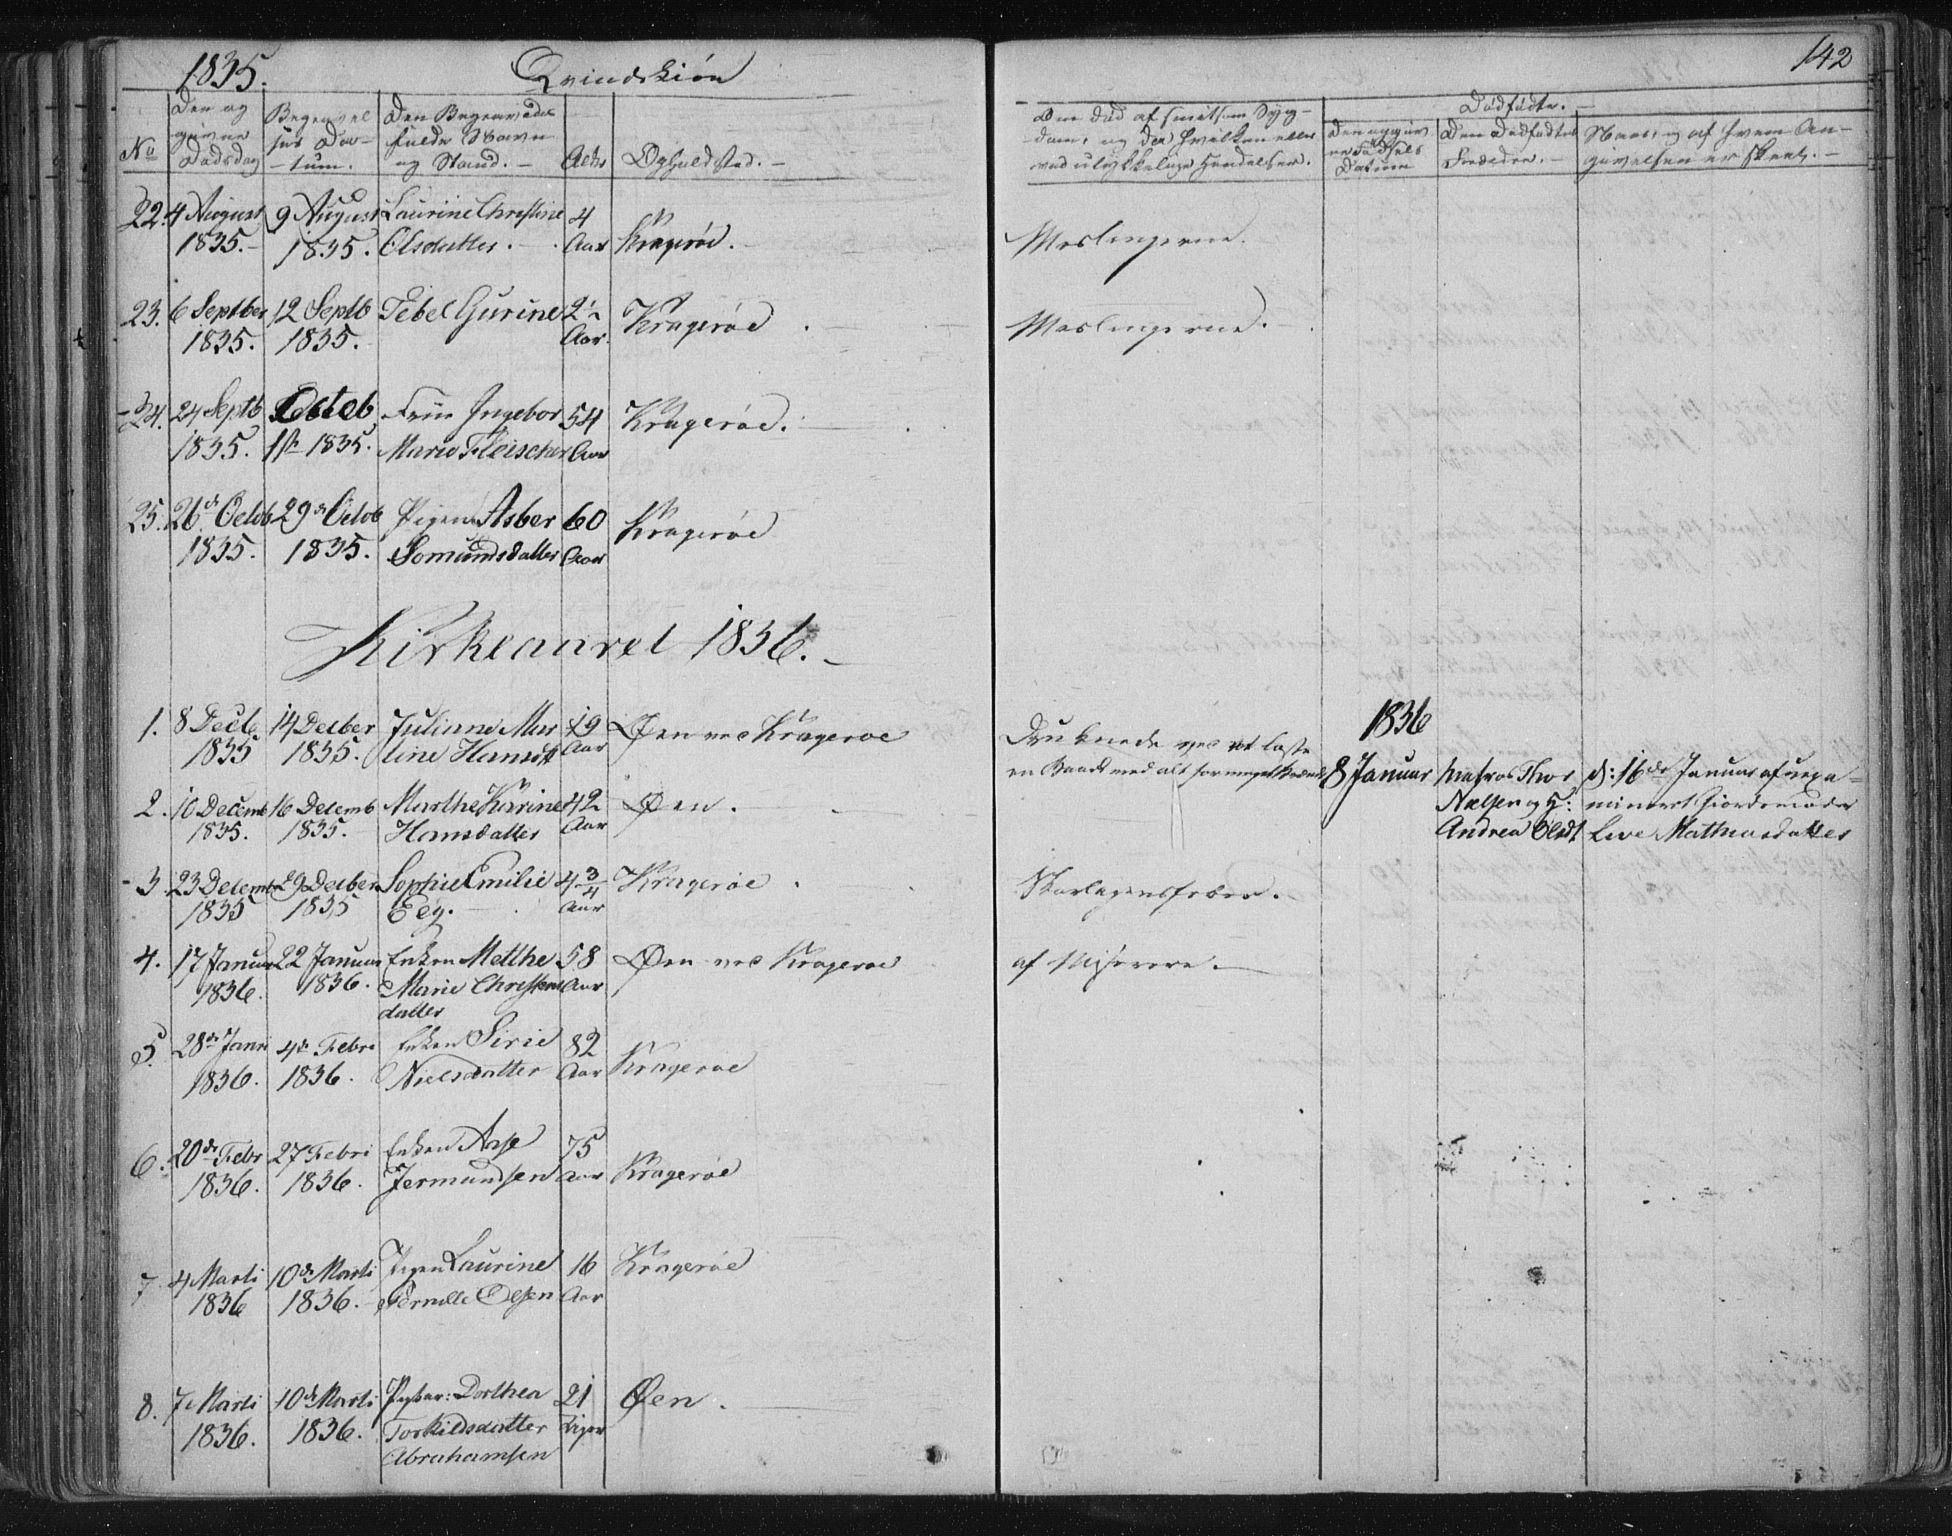 SAKO, Kragerø kirkebøker, F/Fa/L0005: Ministerialbok nr. 5, 1832-1847, s. 142